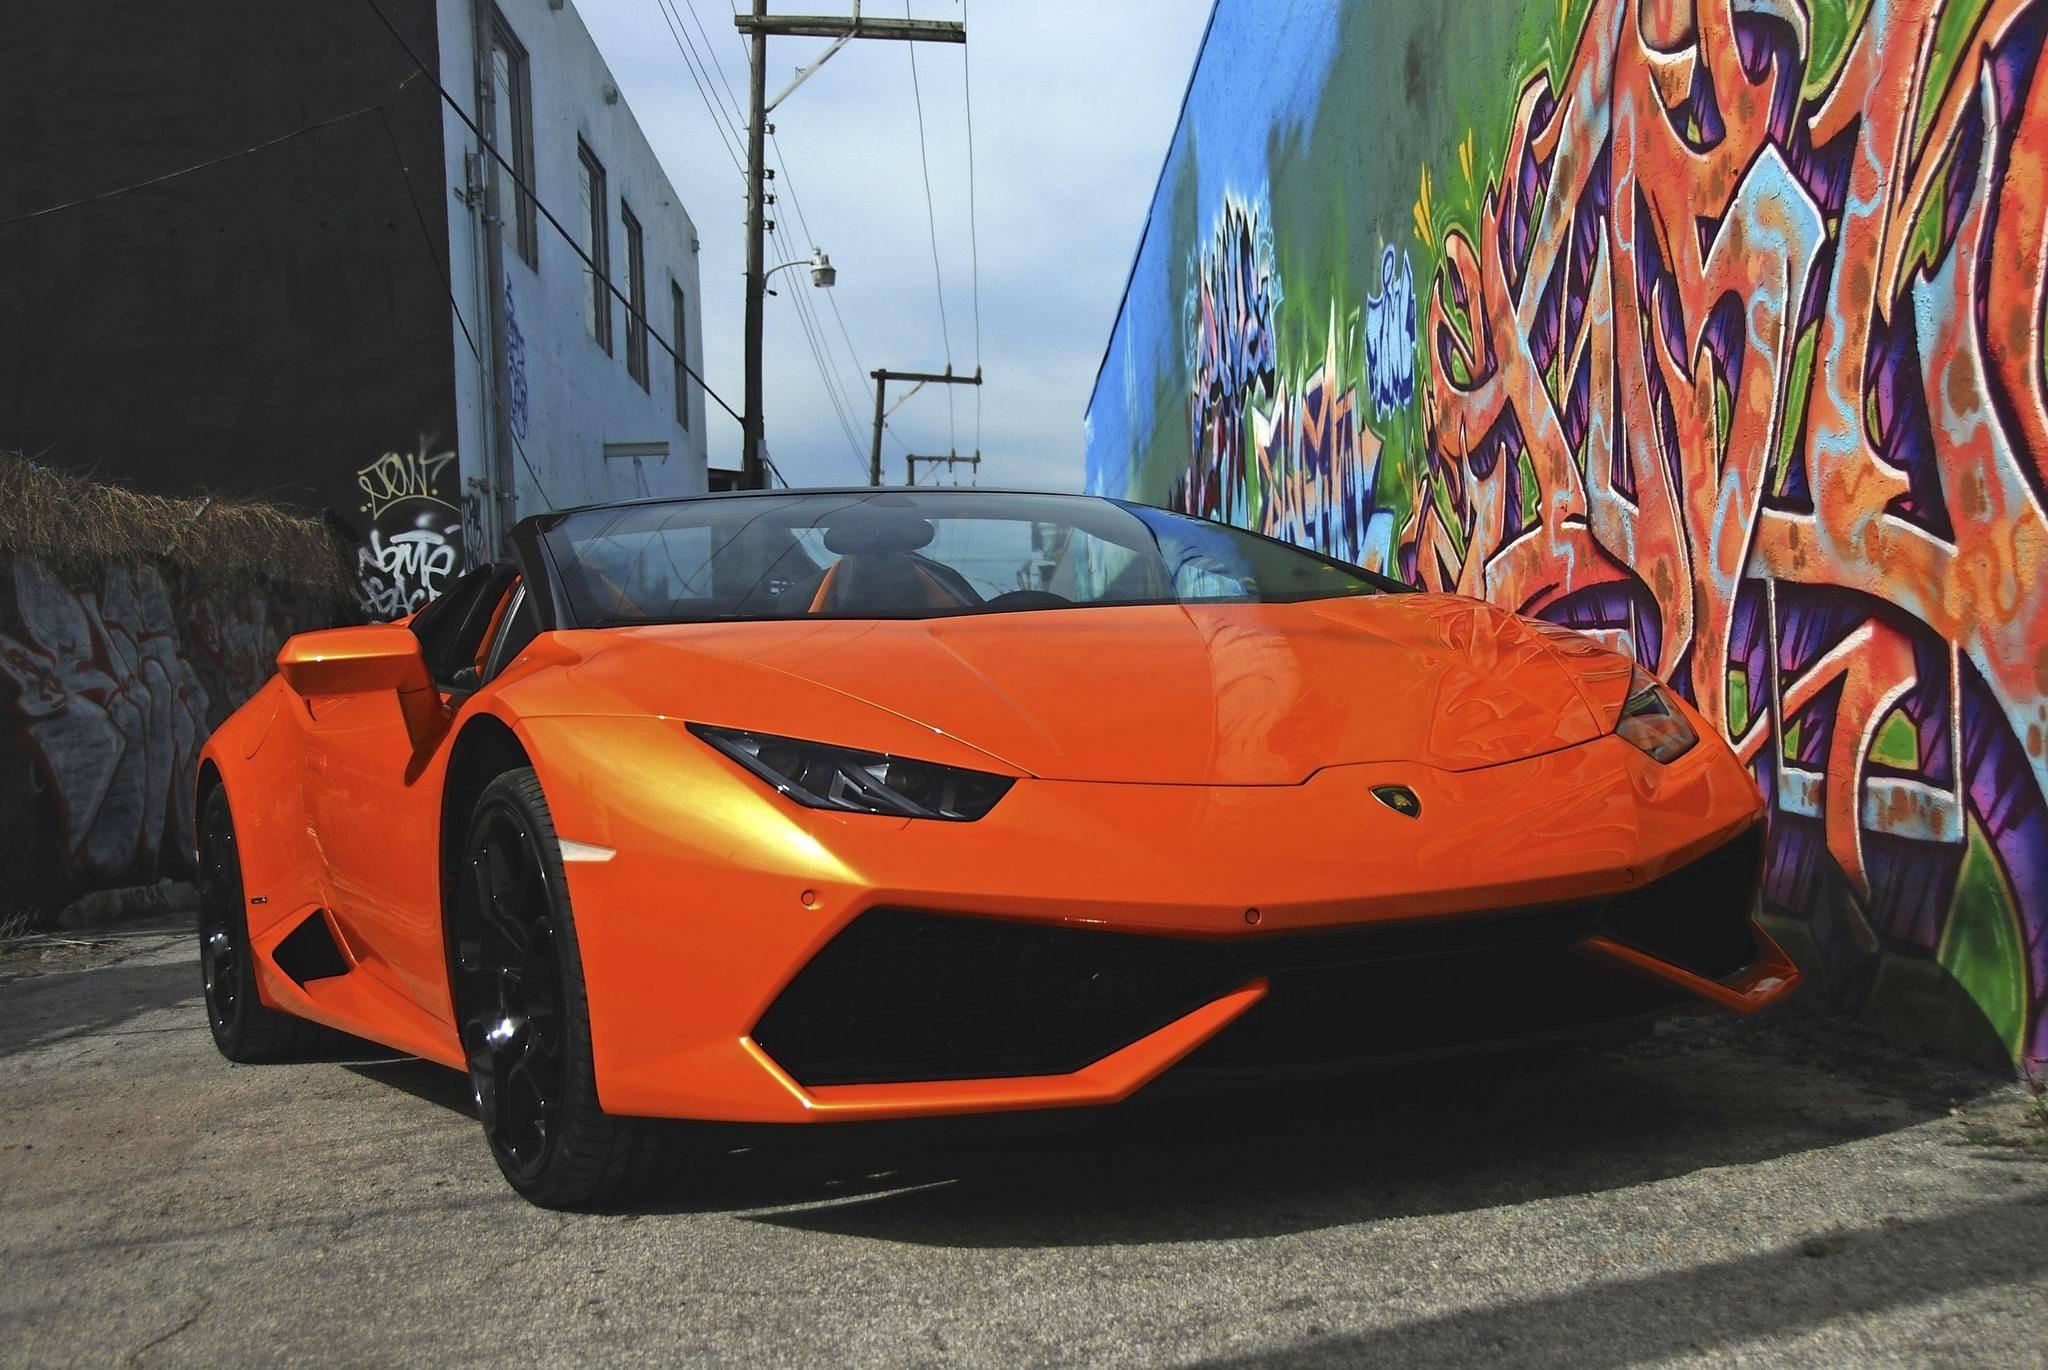 QGTQNUSDPJDHJGWCG3BBJXIWGU Marvelous Lamborghini Huracan Hack asphalt 8 Cars Trend